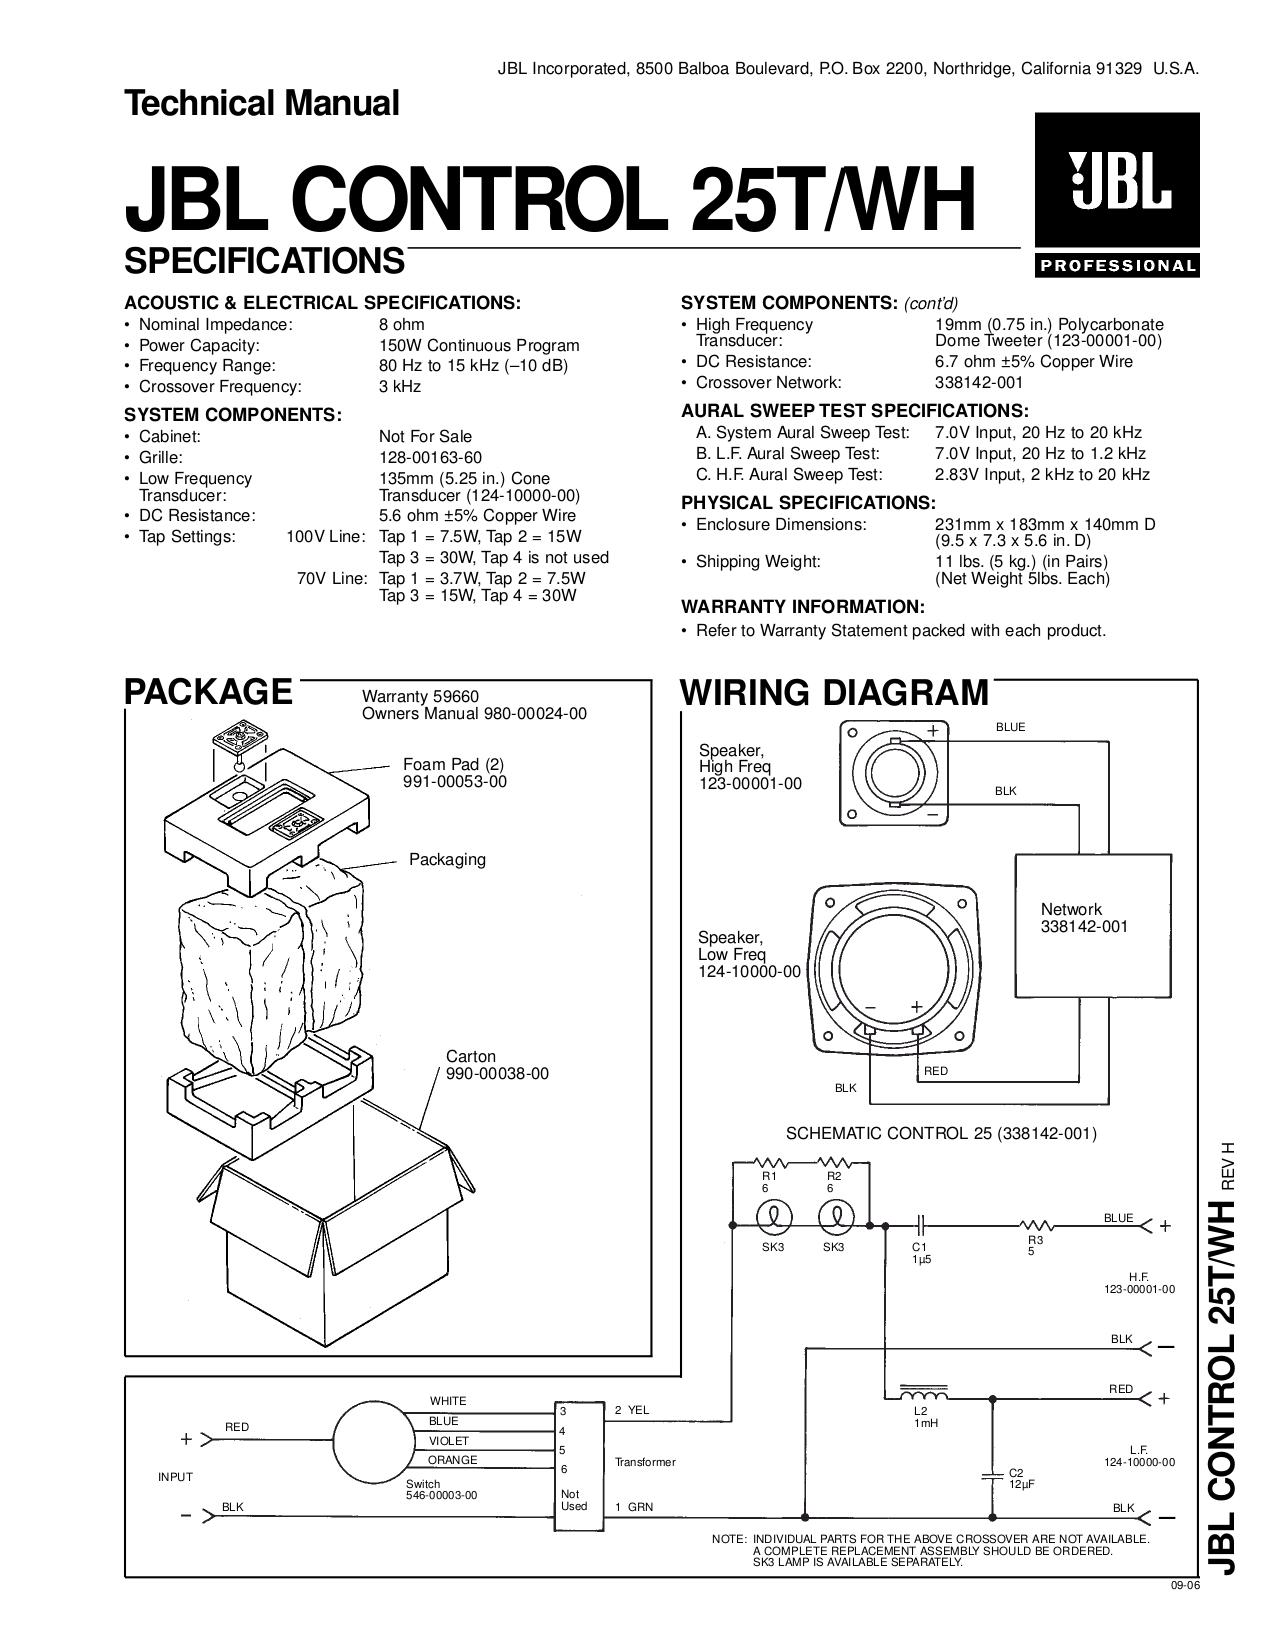 download free pdf for jbl control control 25 speaker manual rh umlib com JBL Control 25Av Manual JBL Control 28 Subwoofer